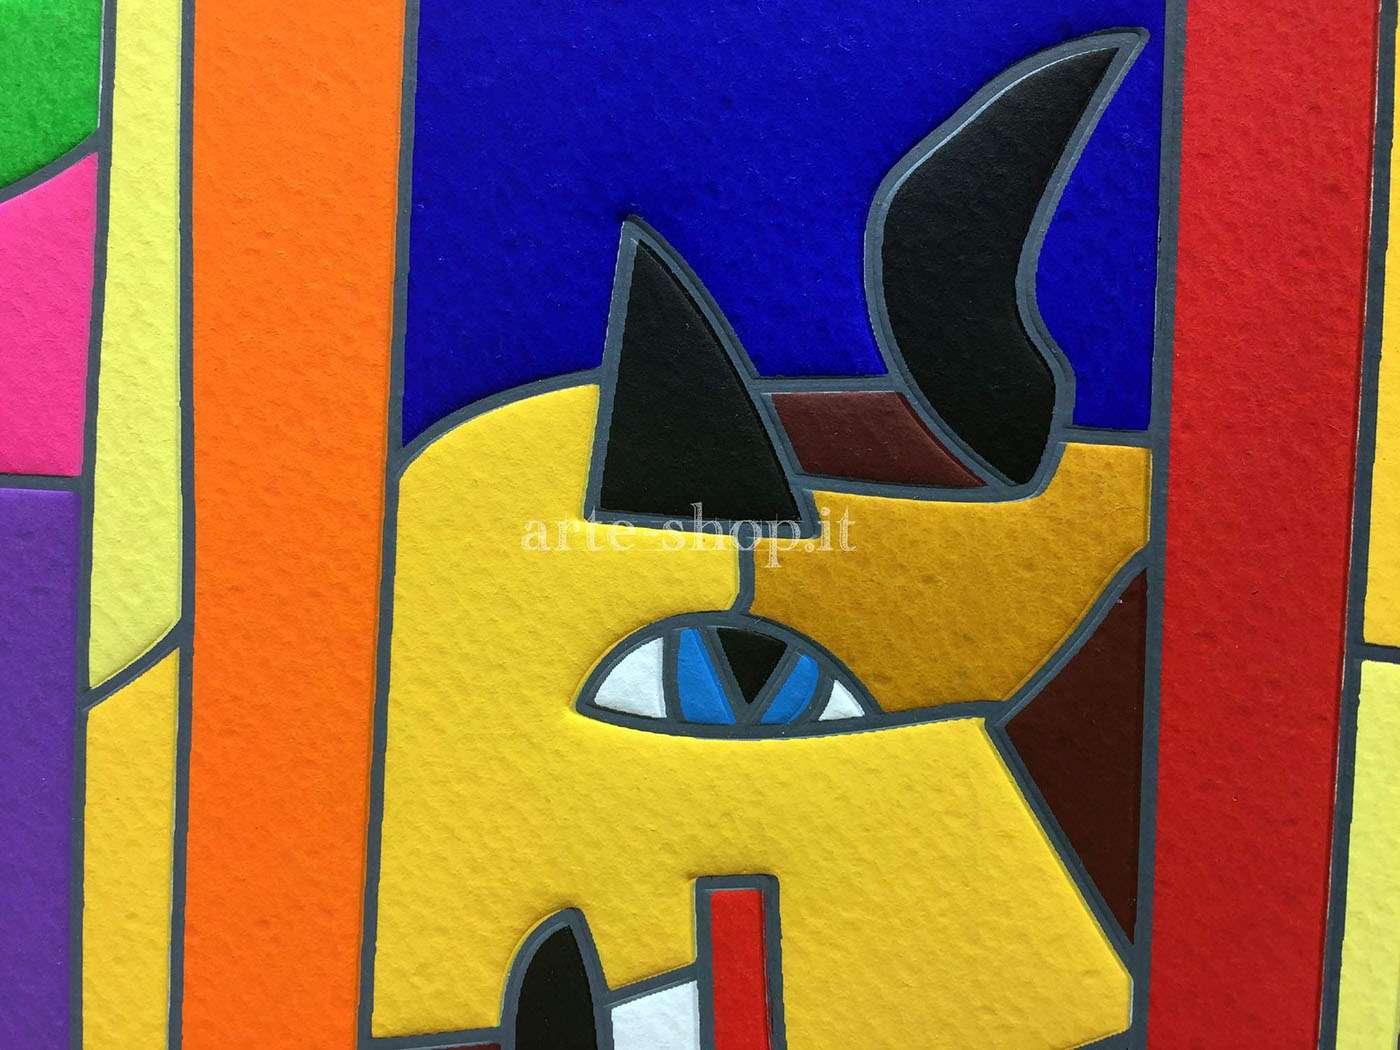 arte pentagono shop dettaglio numero 377